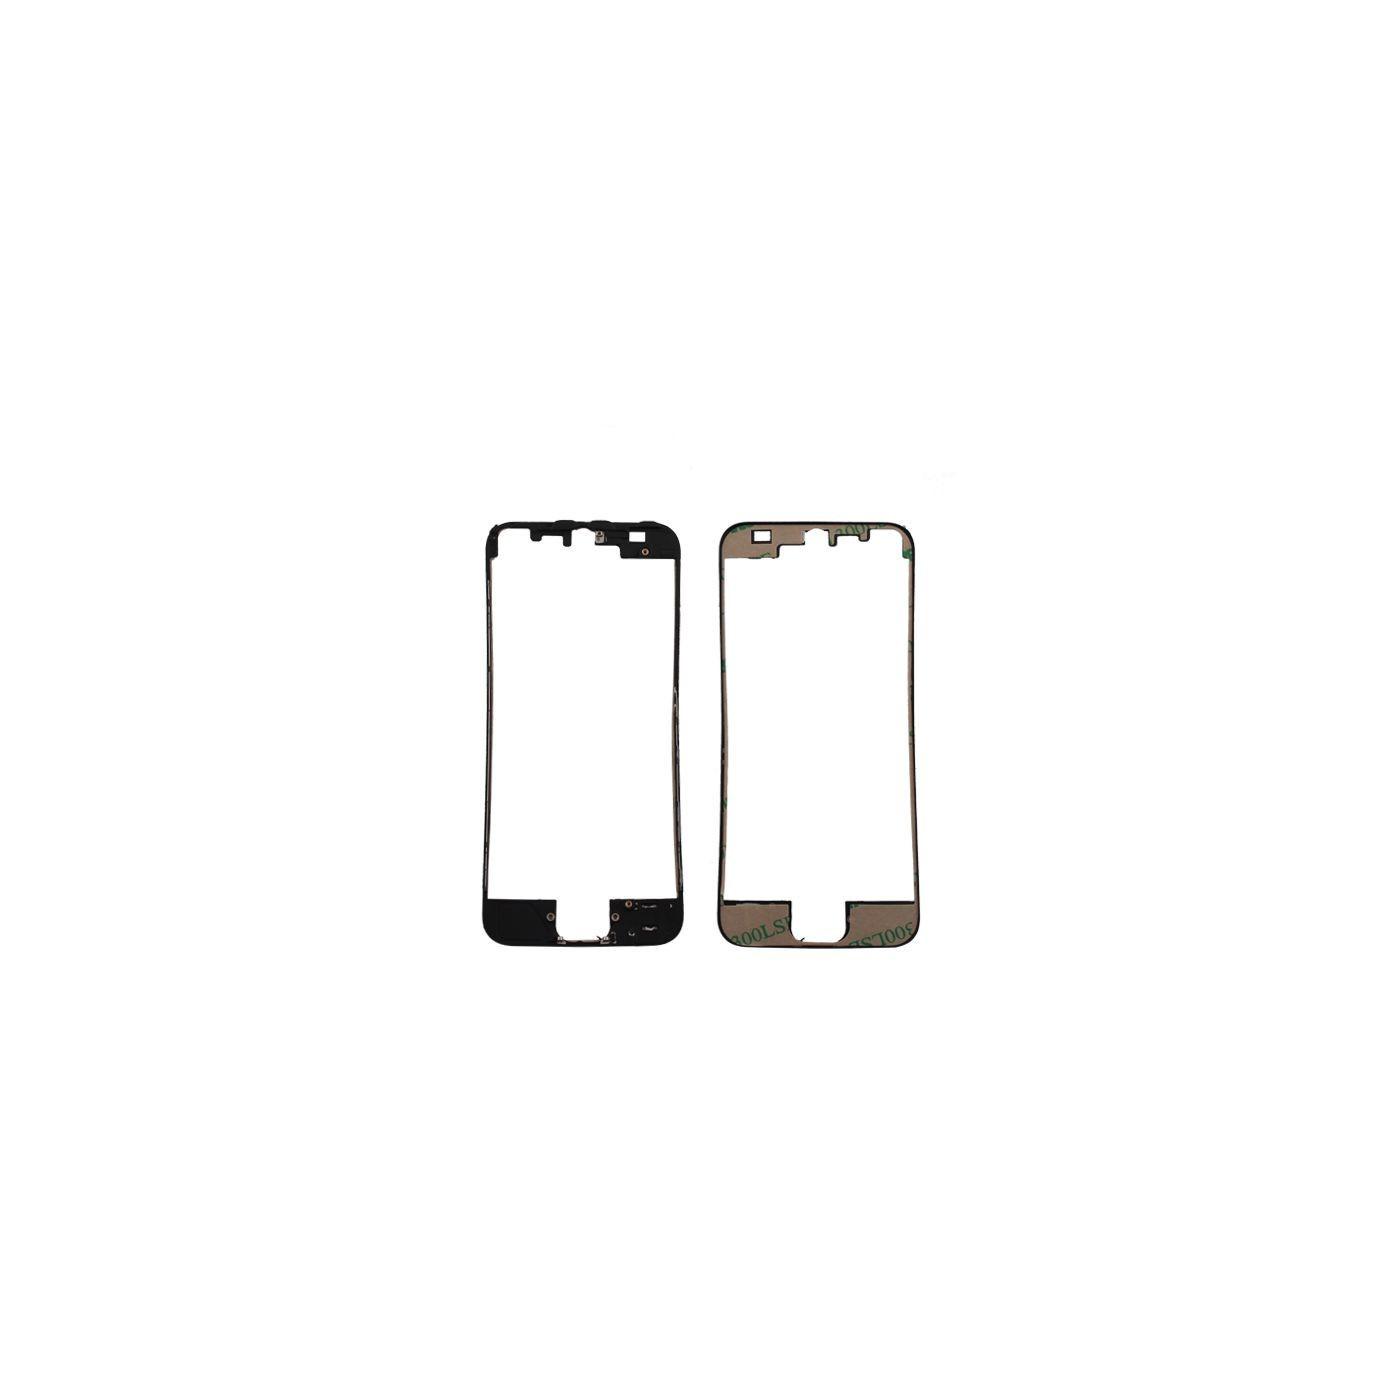 Marco digitalizador de fotograma para iphone 5 negro con etiqueta